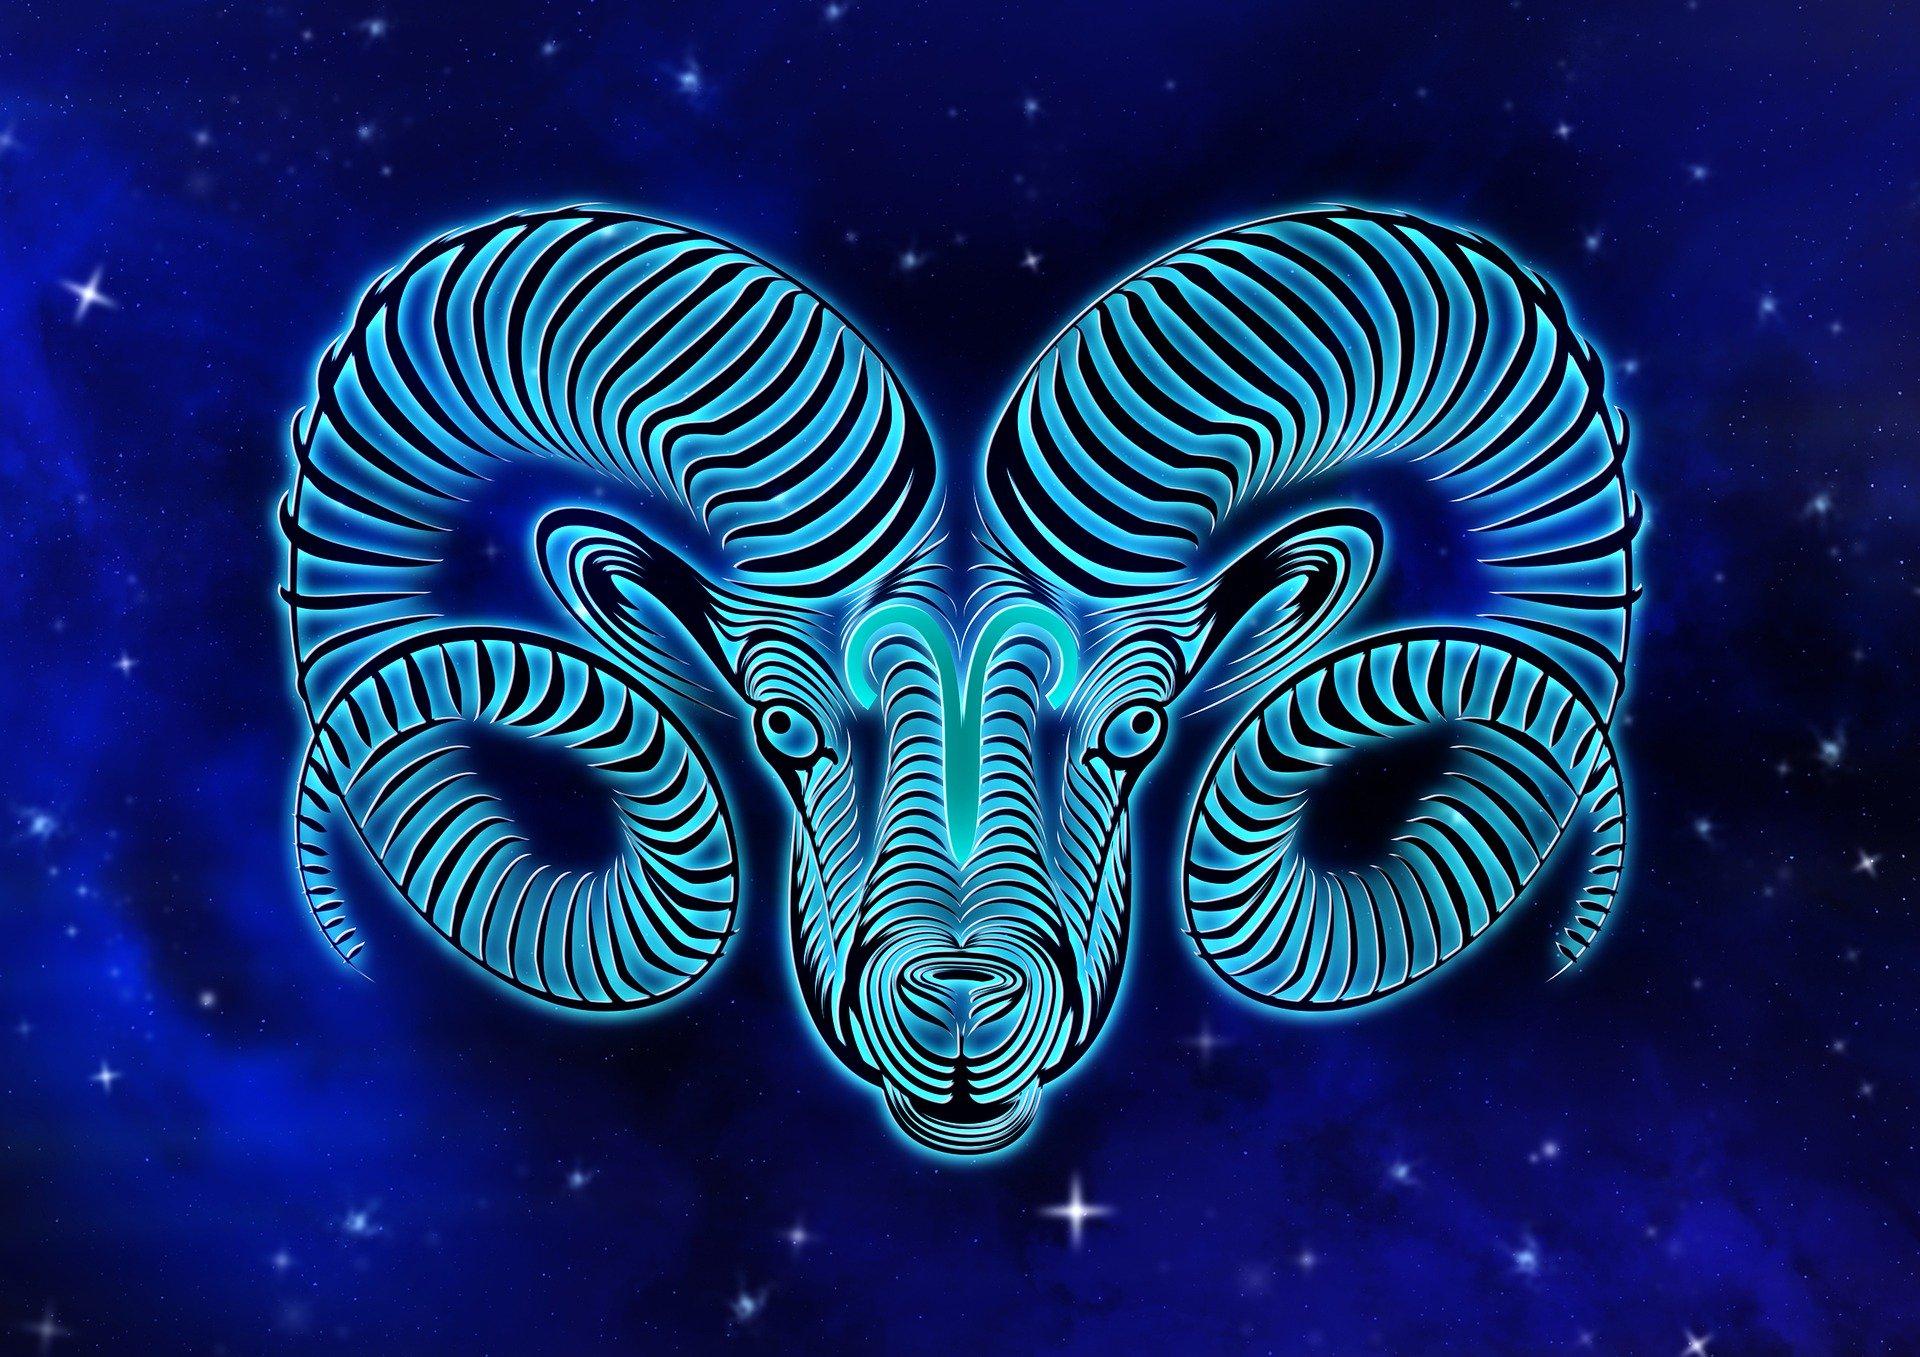 Horoscop anul 2013 Anul Sarpelui de apa - zodia Berbec